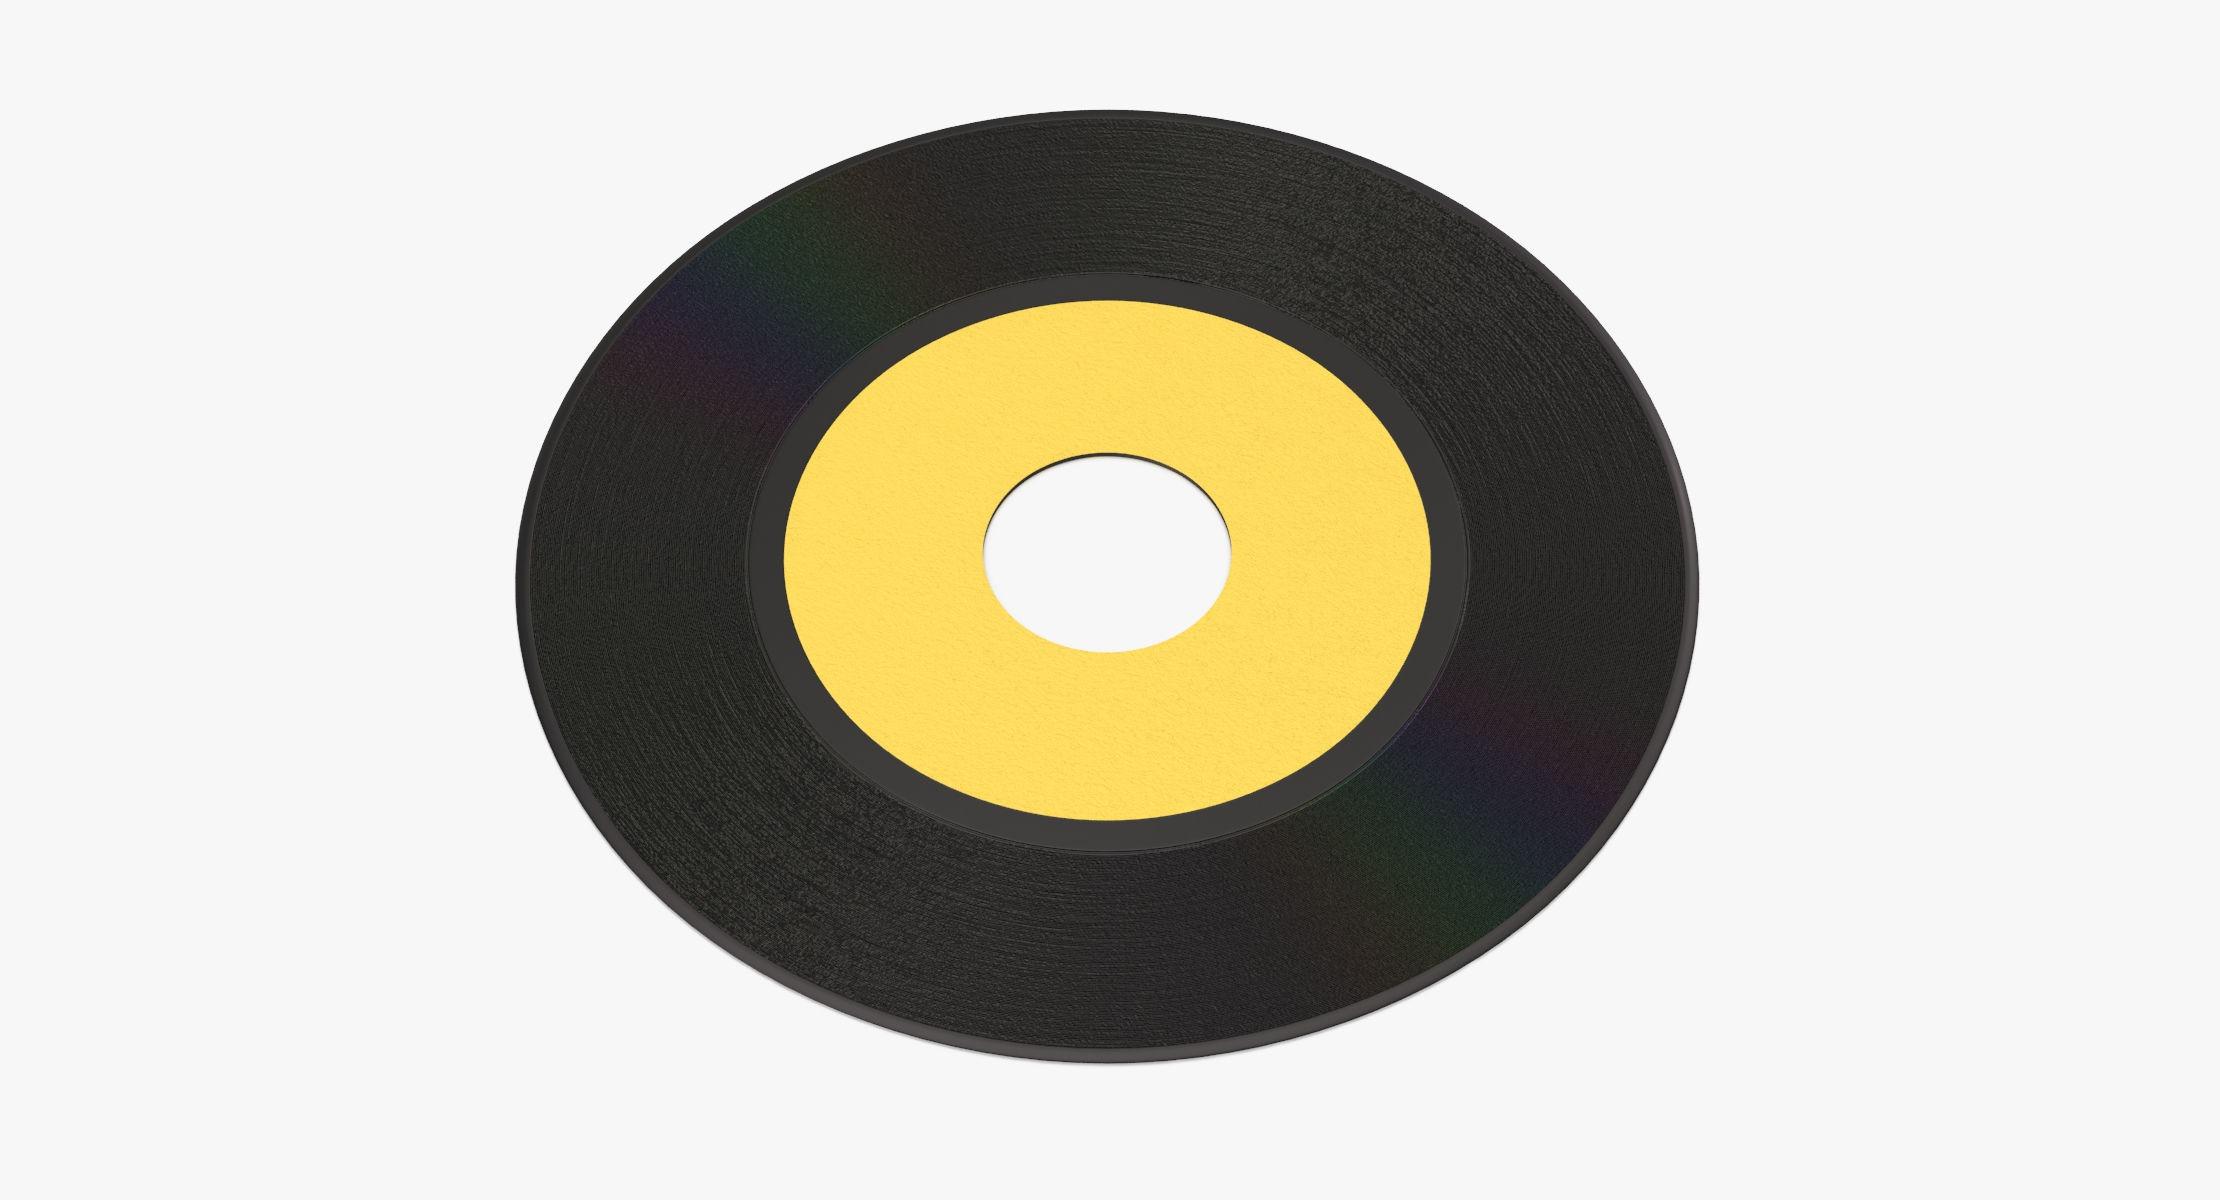 Vinyl LP 02 - reel 1